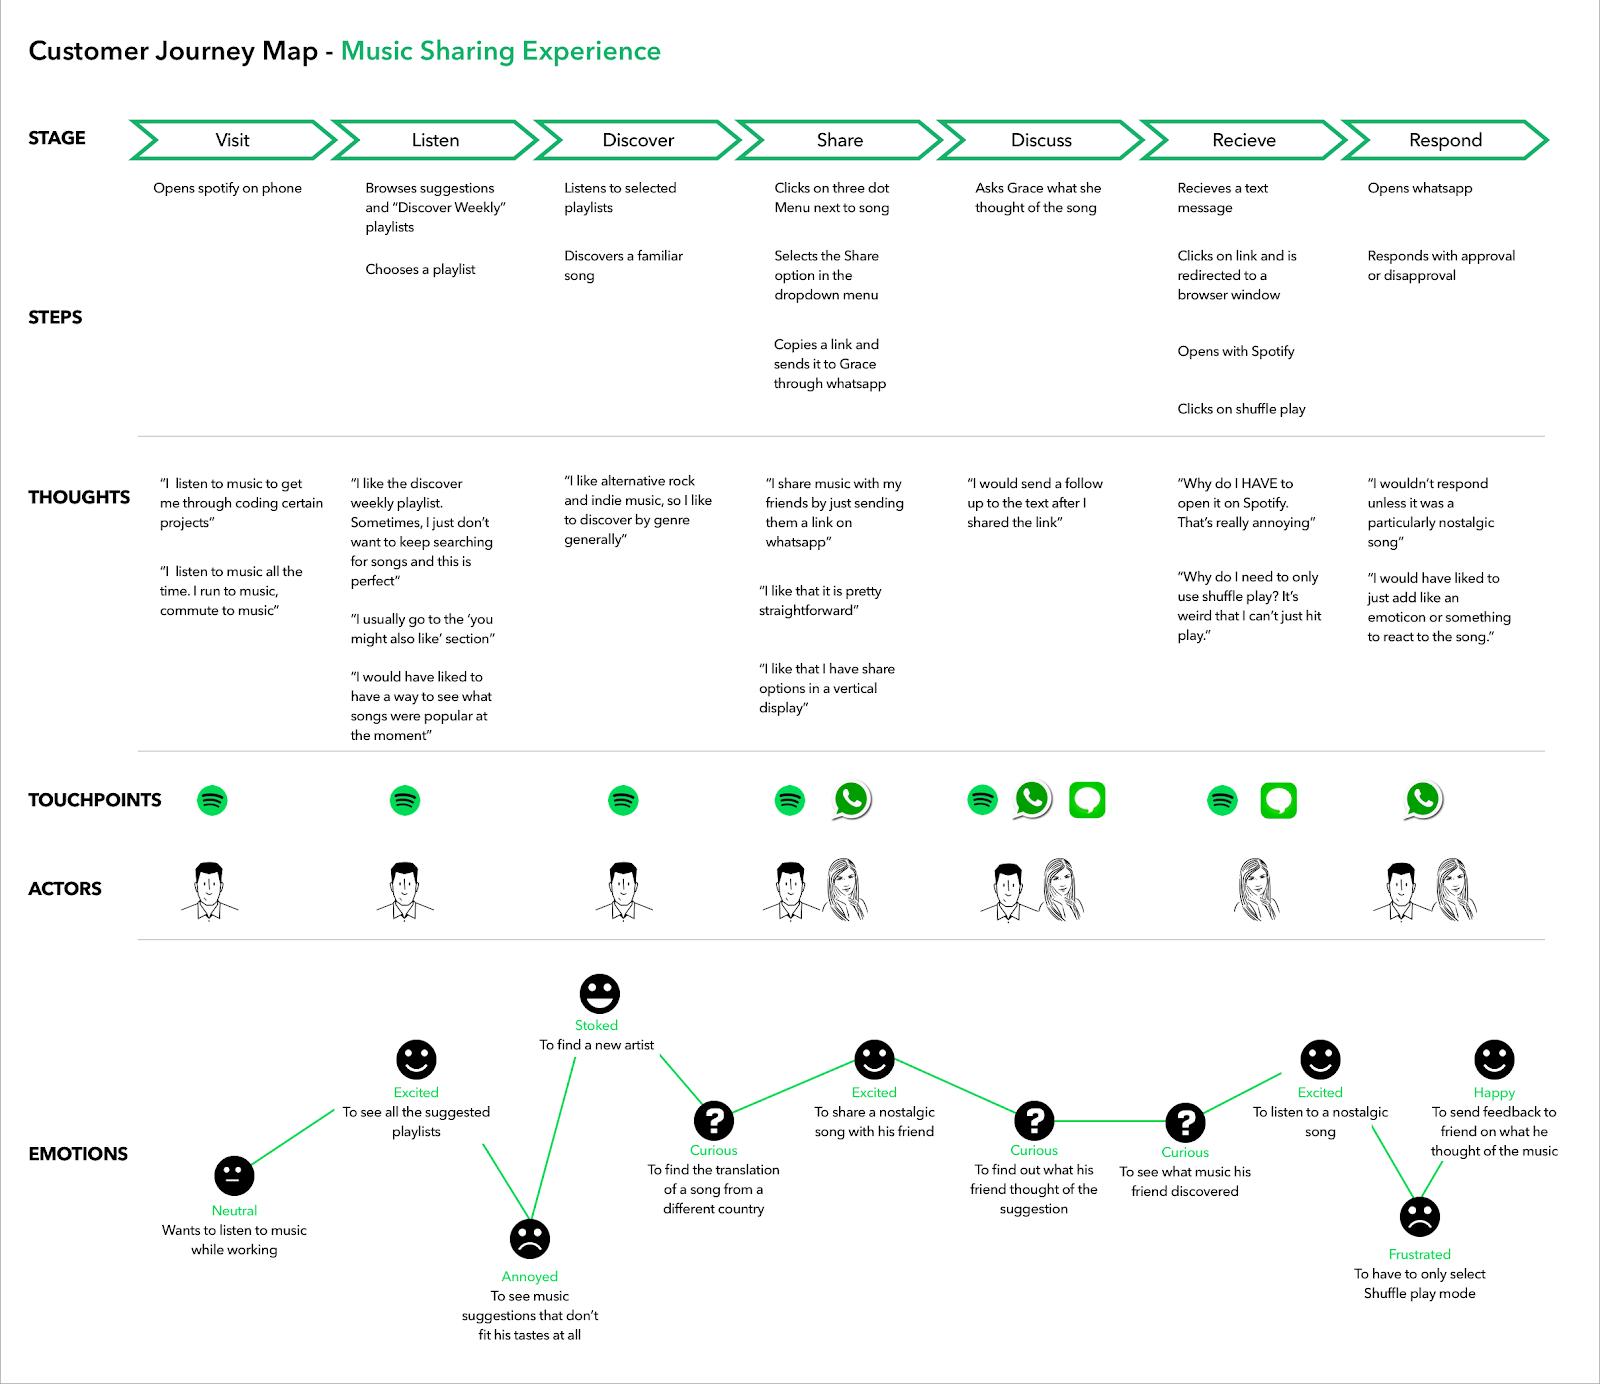 Spotify Customer Journey Map